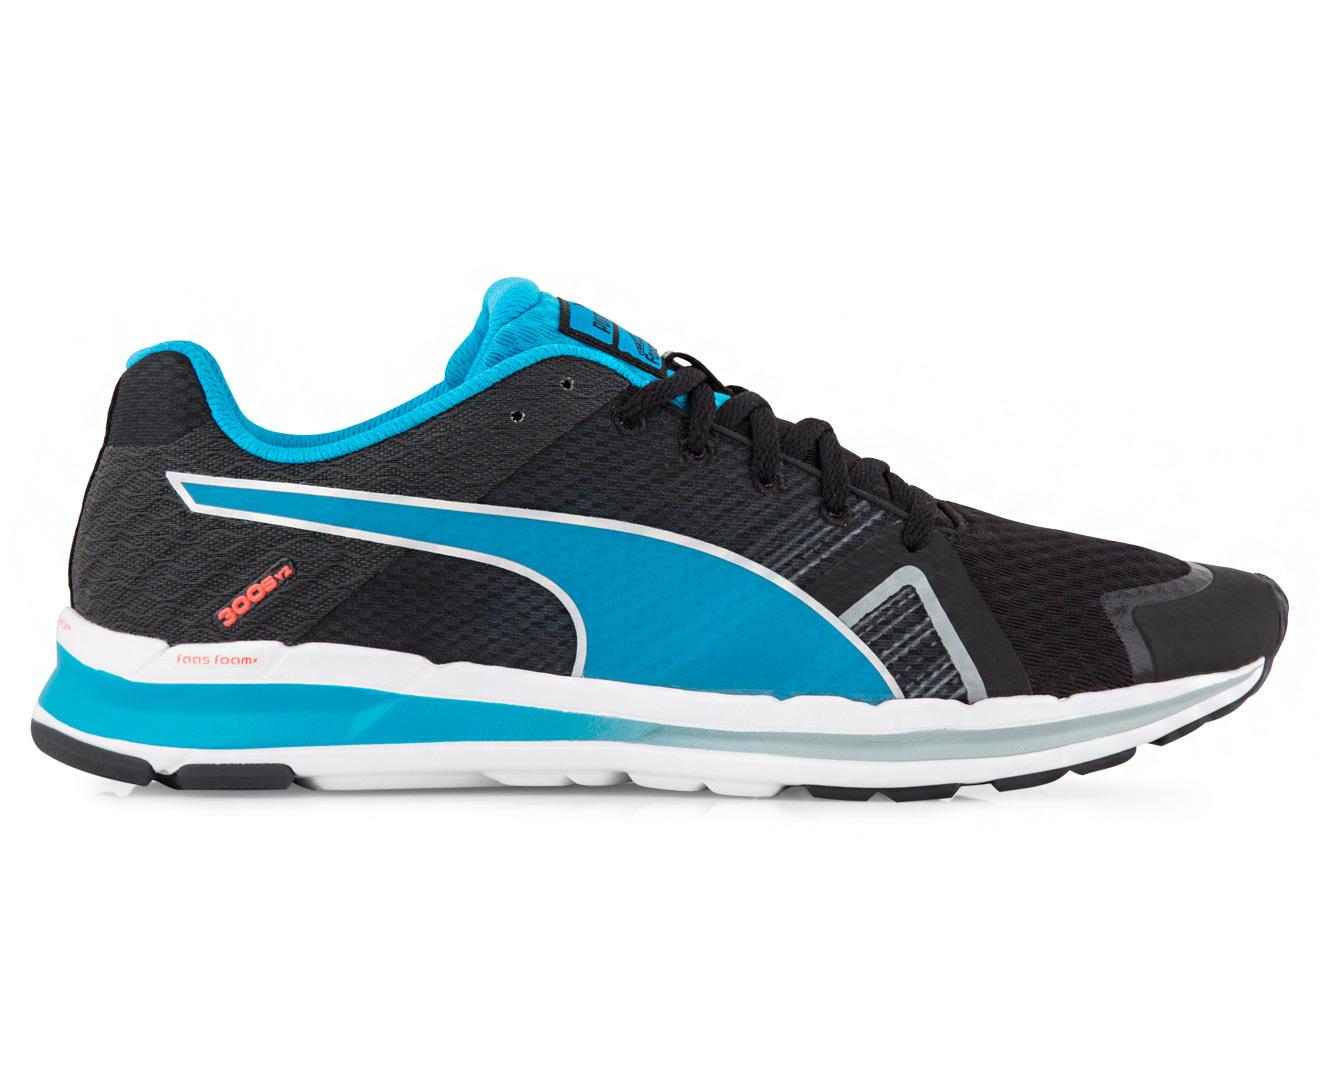 puma online, Puma Faas 300 Blue Red Running Shoes,puma